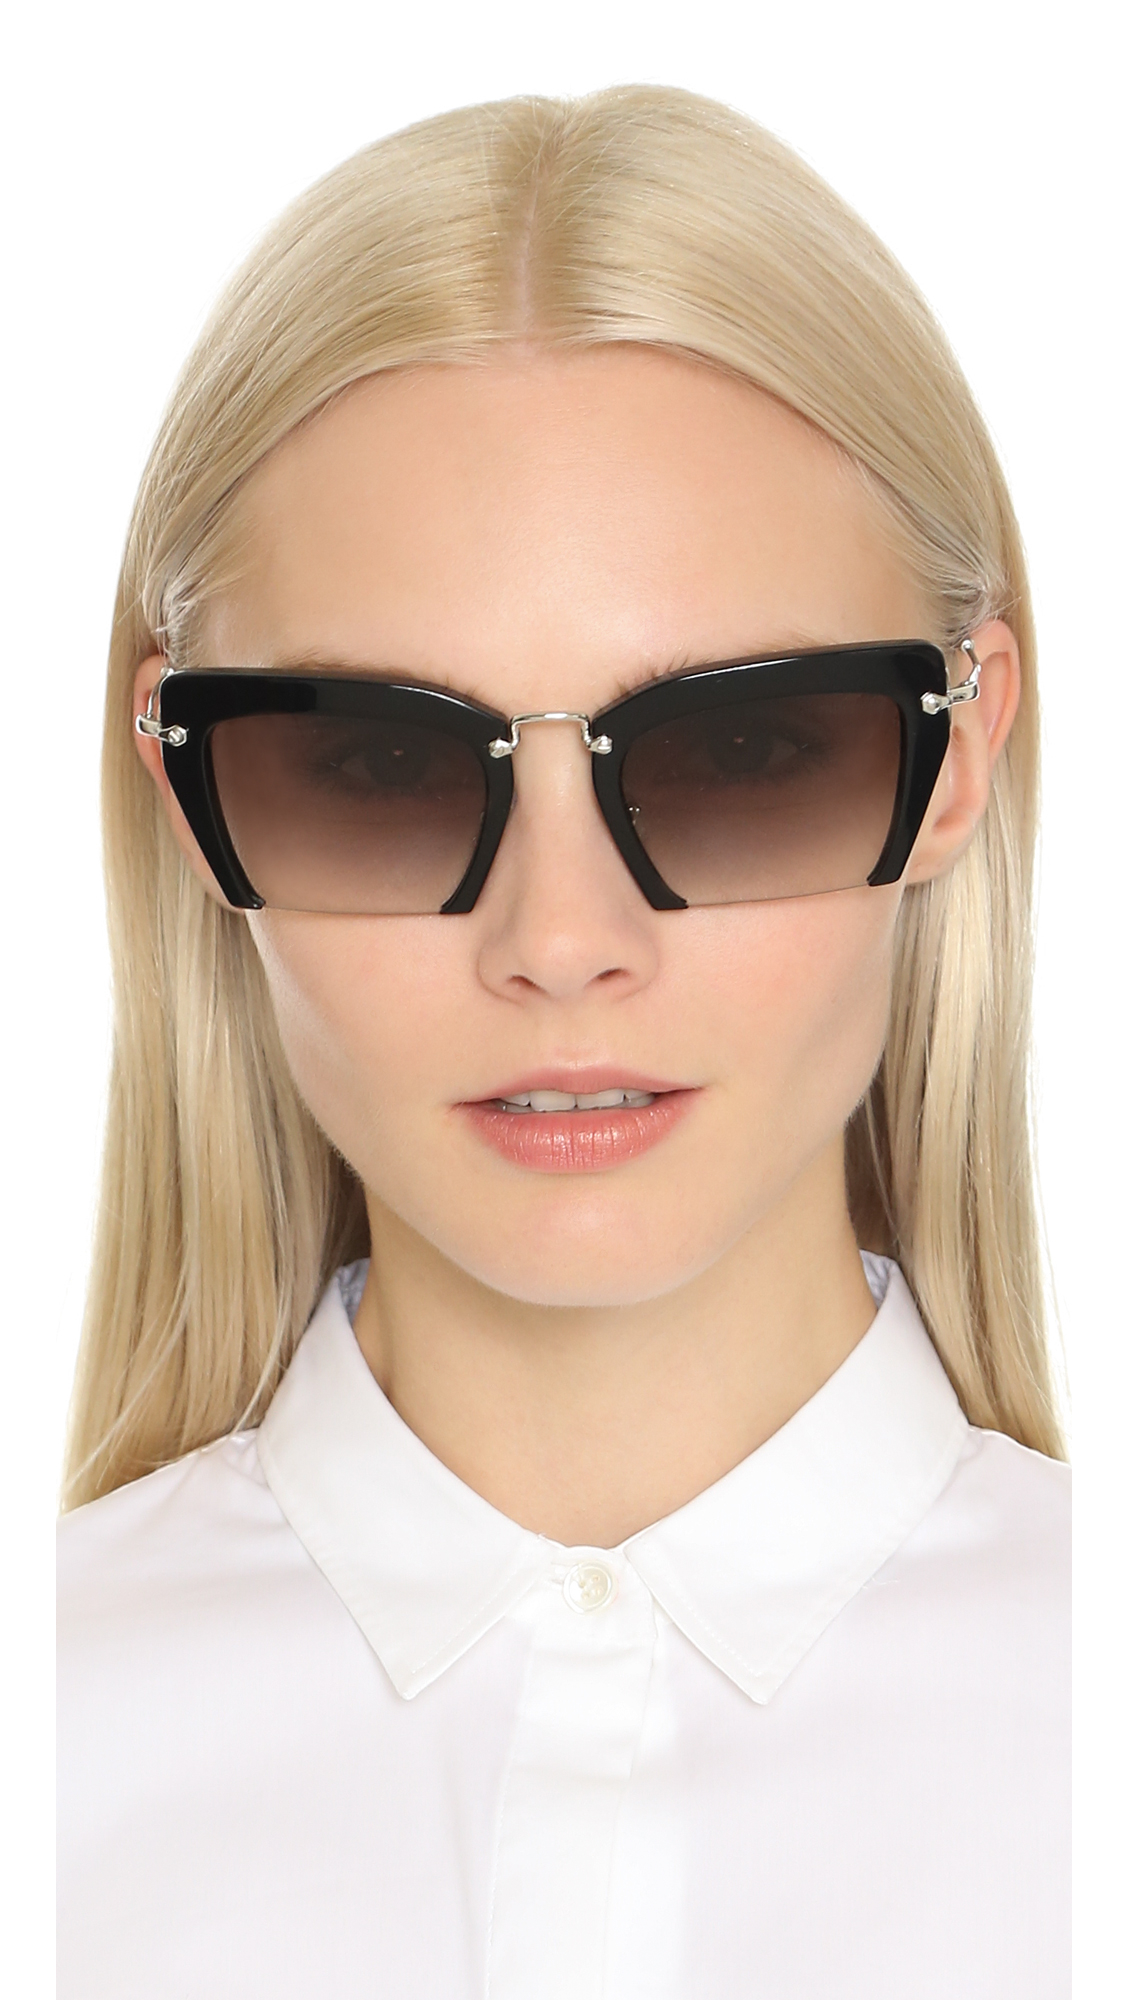 56b72bd4446 Miu miu Cut Frame Sunglasses - Black grey Gradient in Black